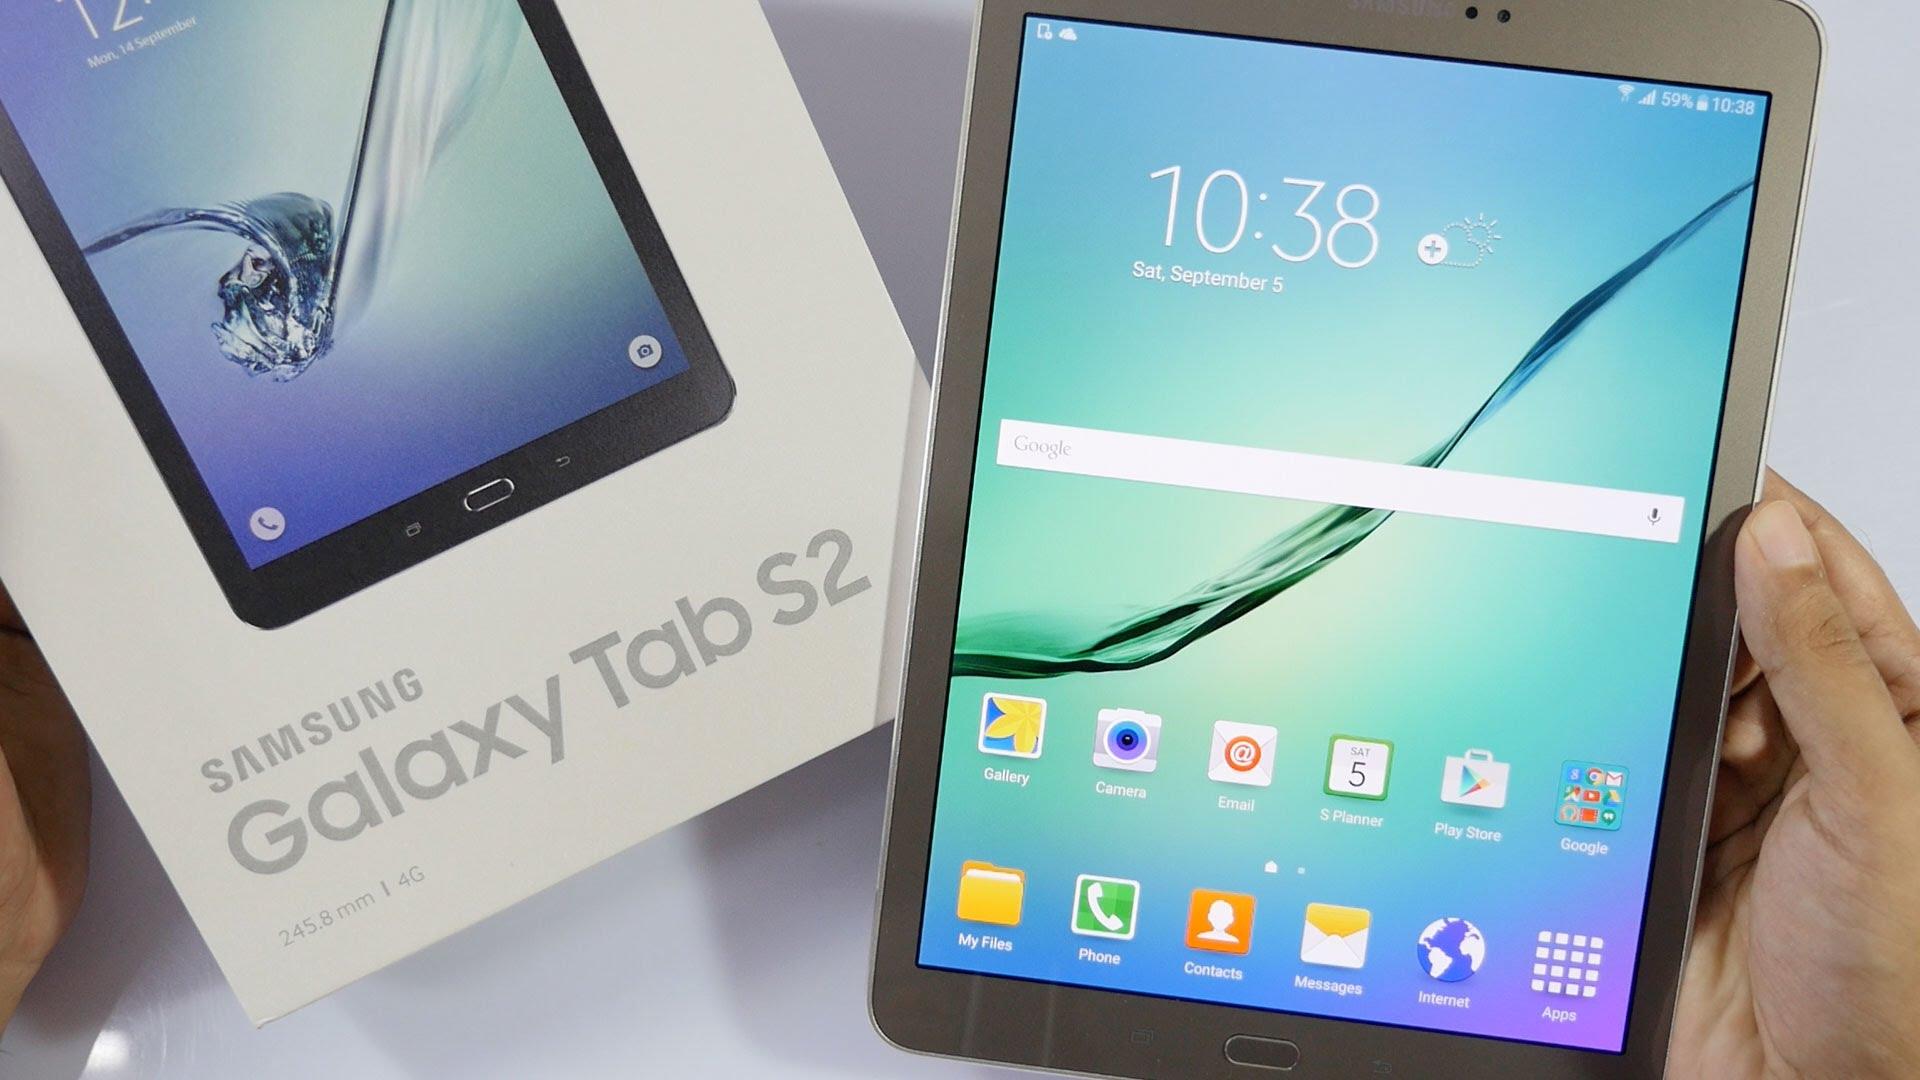 tablette samsung s2 9.7